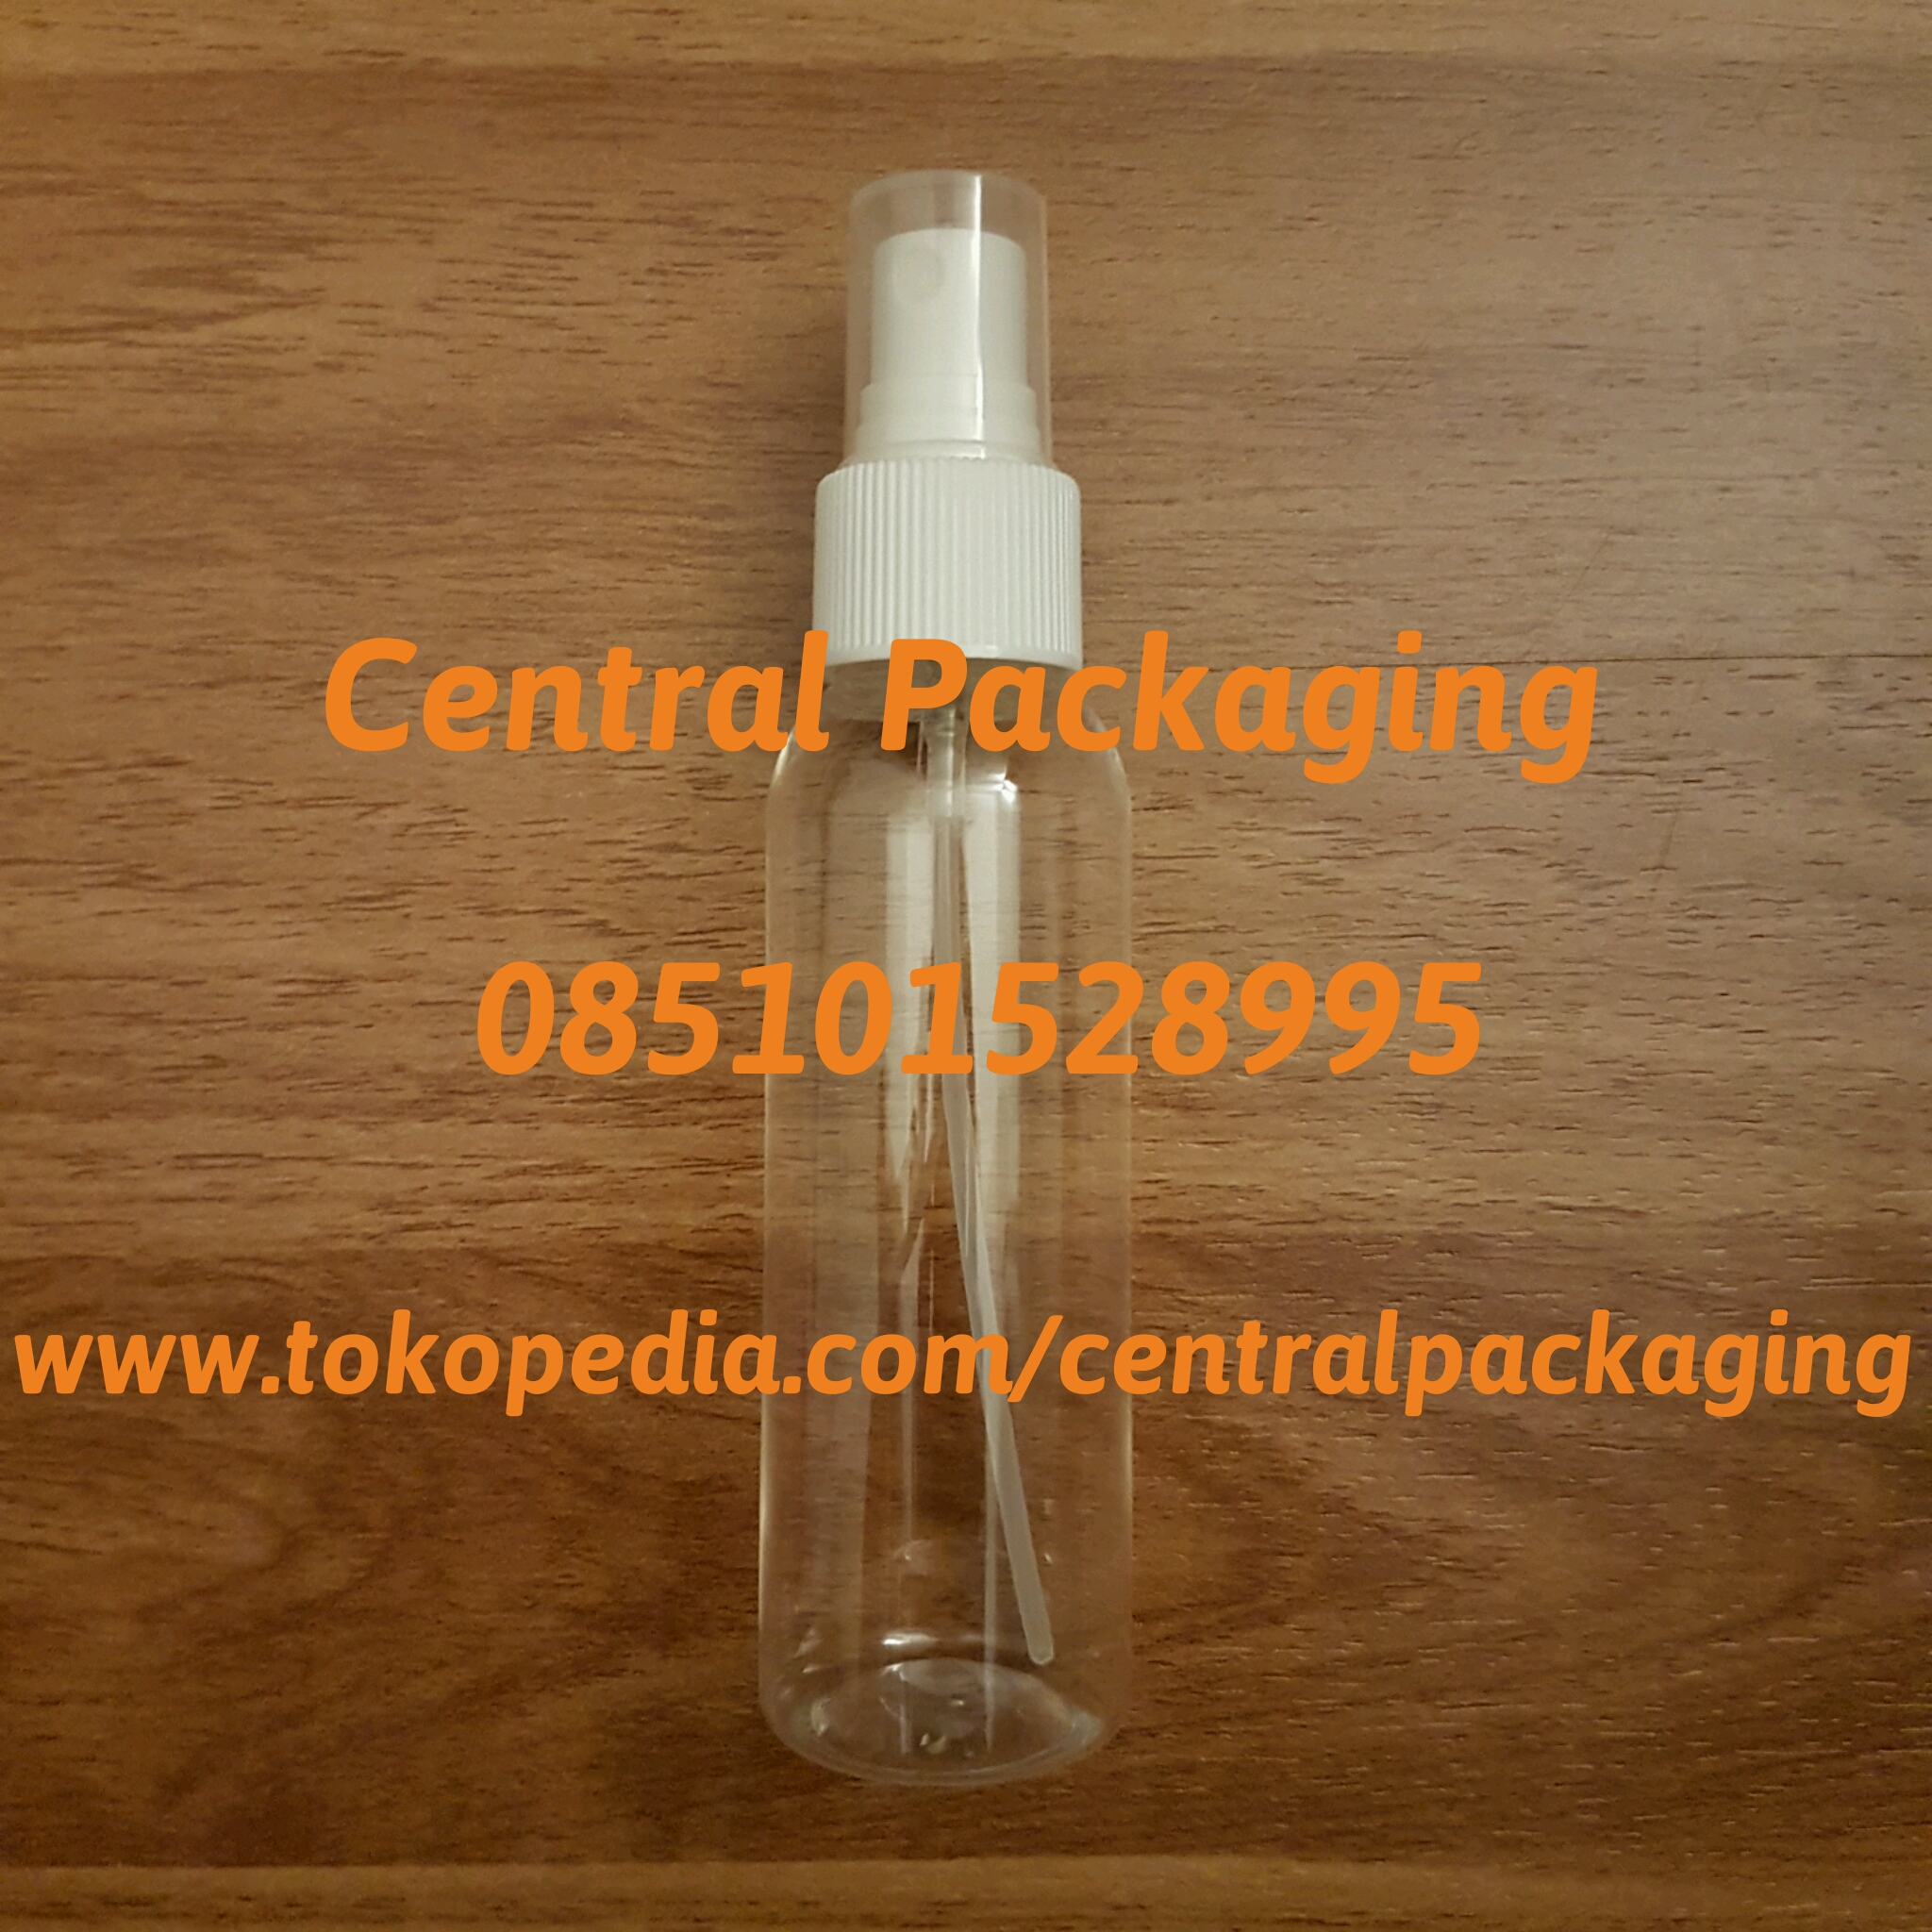 Jual Botol Spray Plastik 100ml Semprot Parfum Minyak Wangi Air Kosong 100 Ml Central Packaging Tokopedia